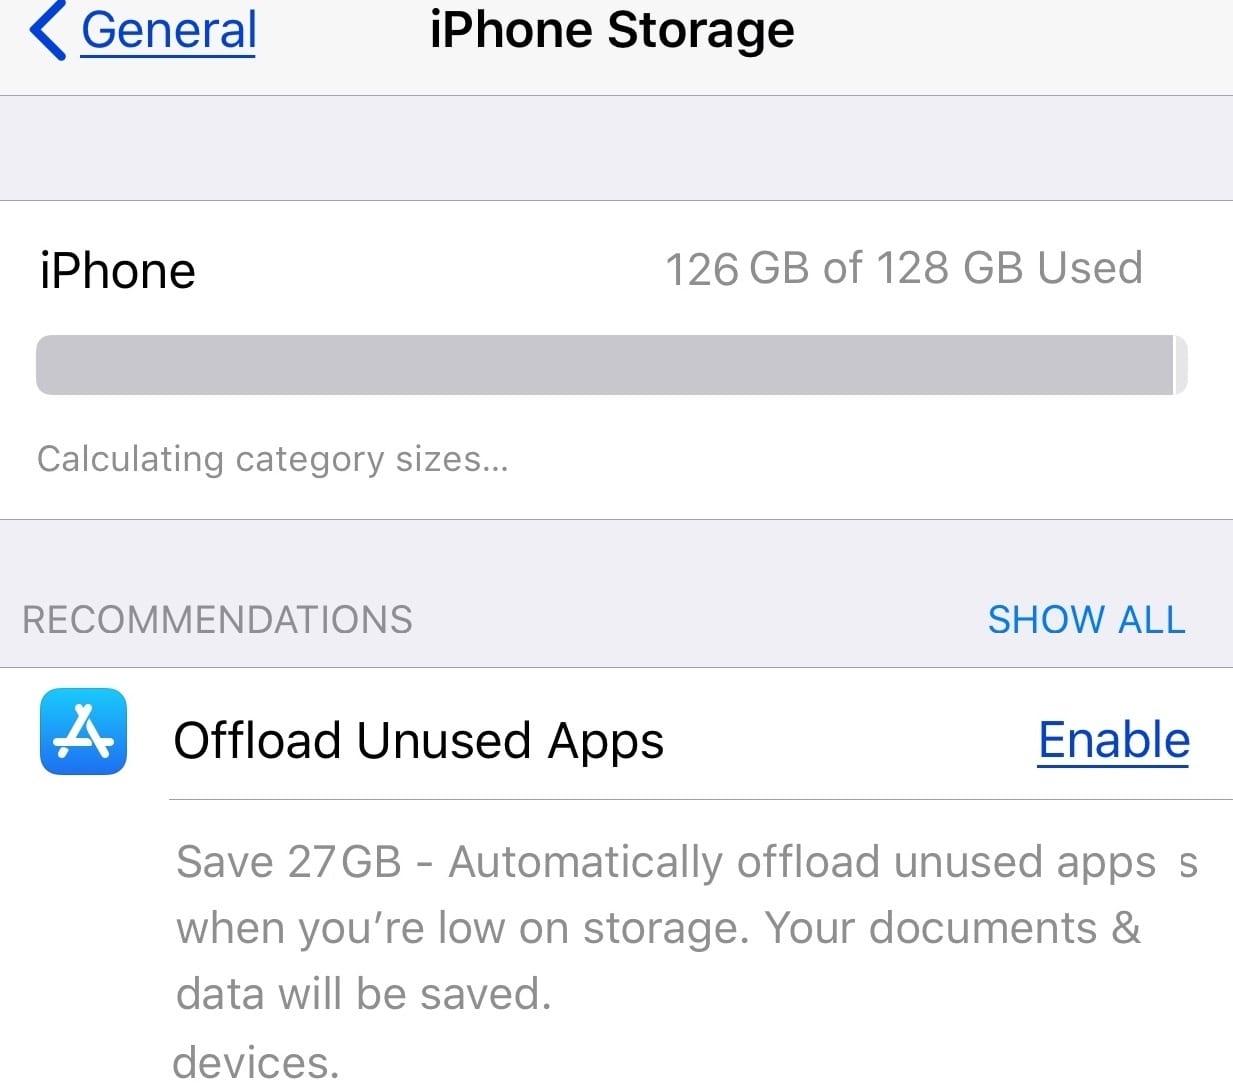 Offload unused apps iphone